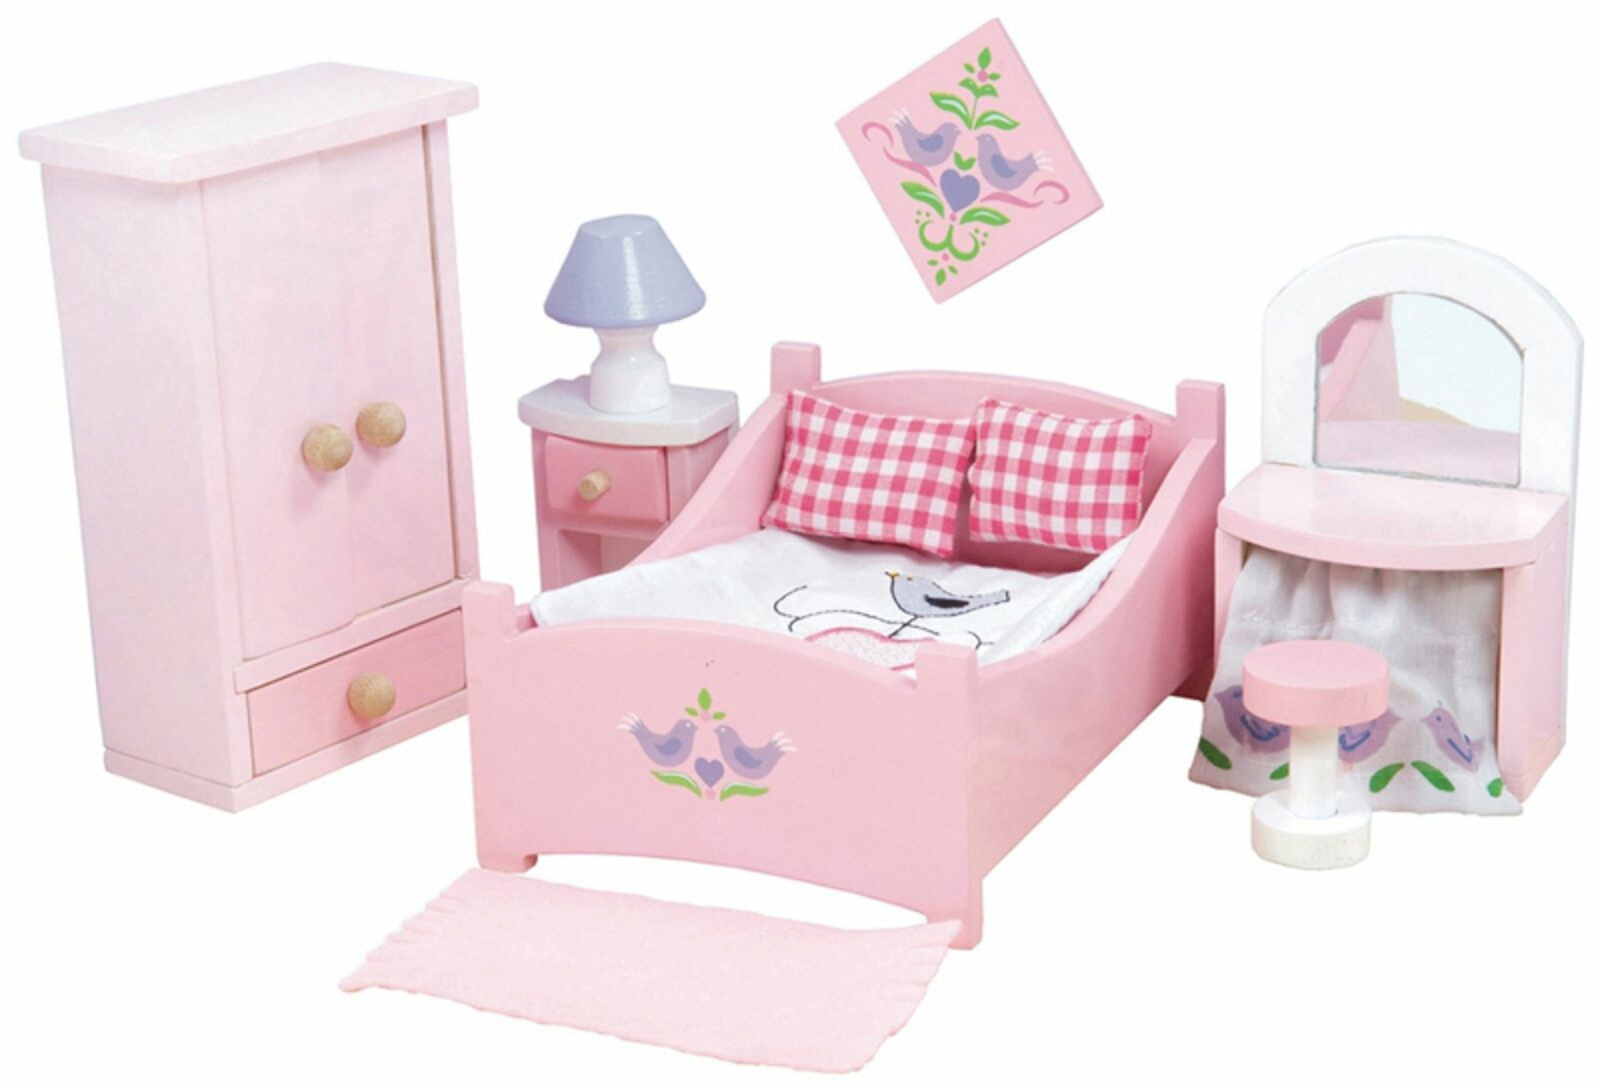 Cameretta Le Toy Van Sugar Plum